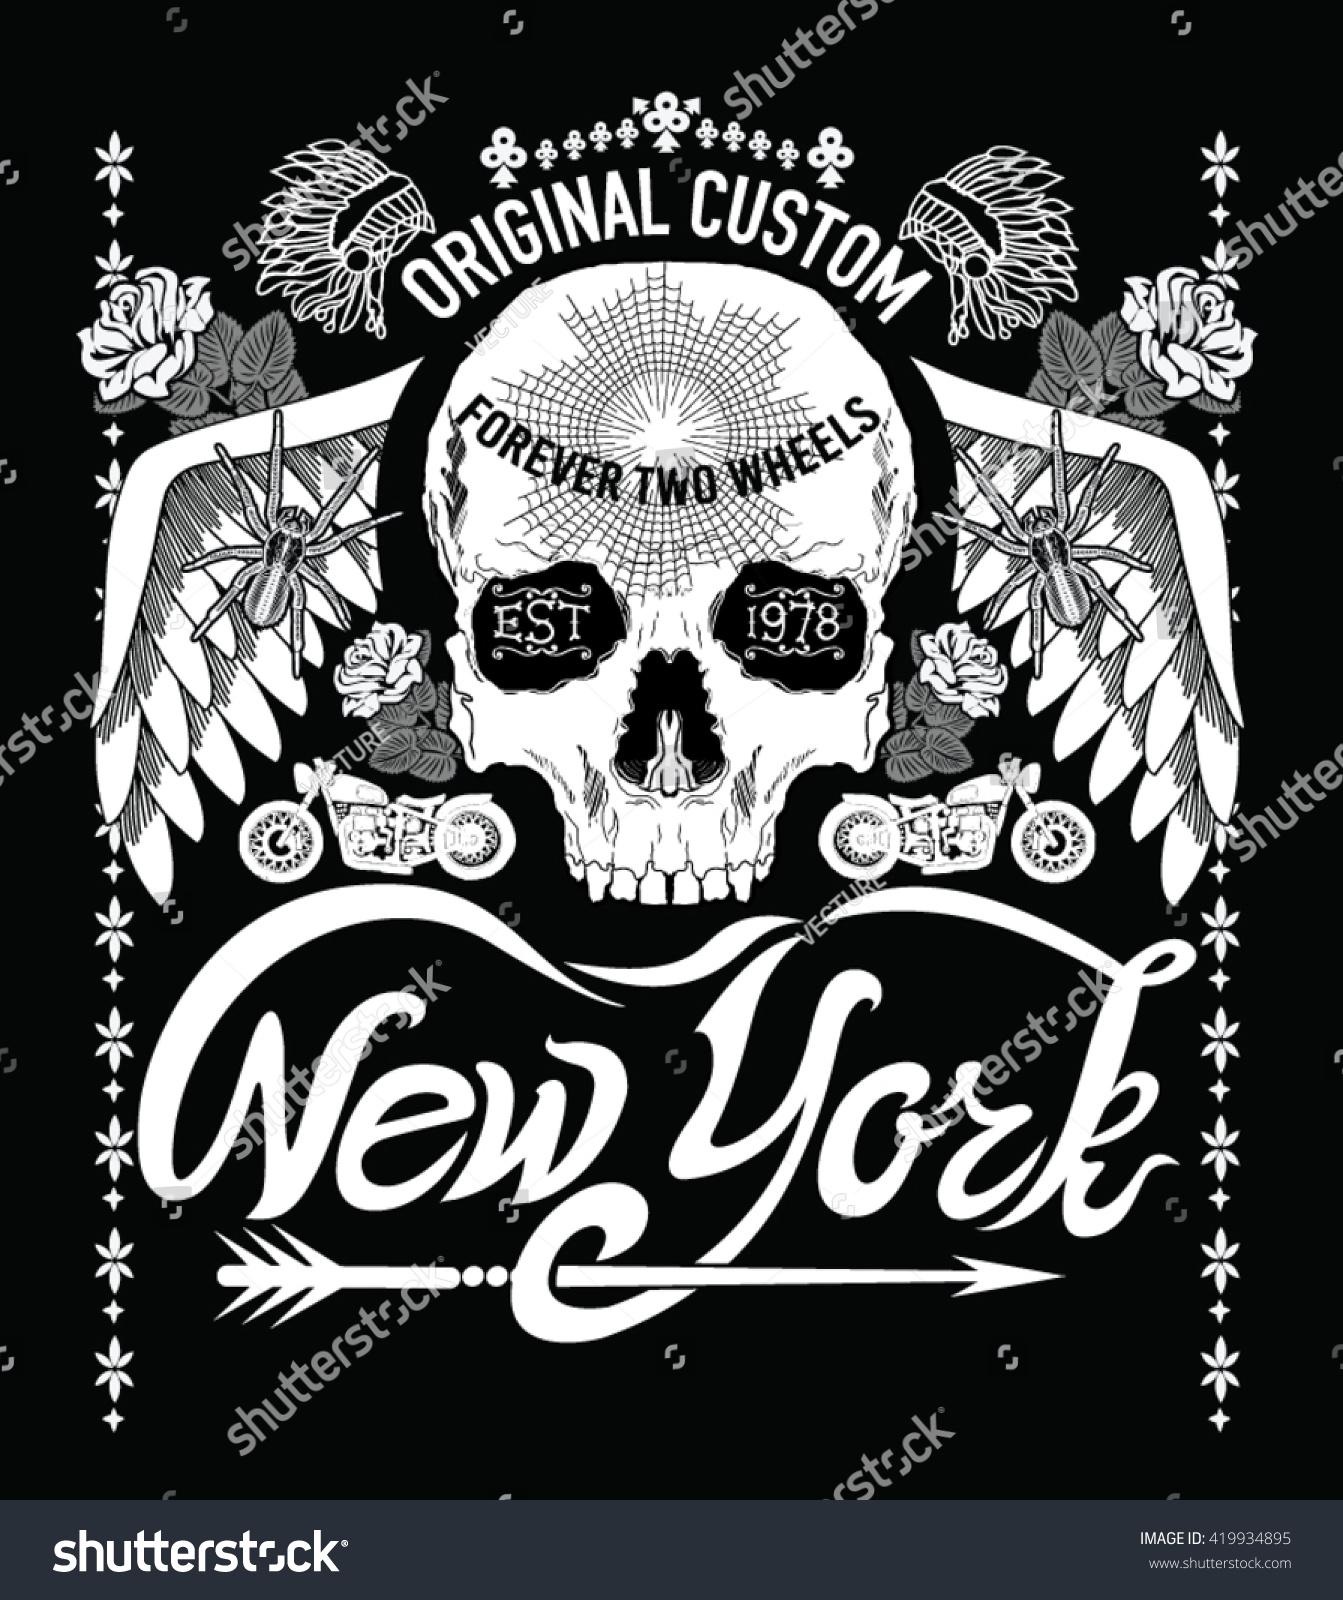 Design t shirt motor - New York Vintage Motor Typographic For T Shirt Design Vector Illustration